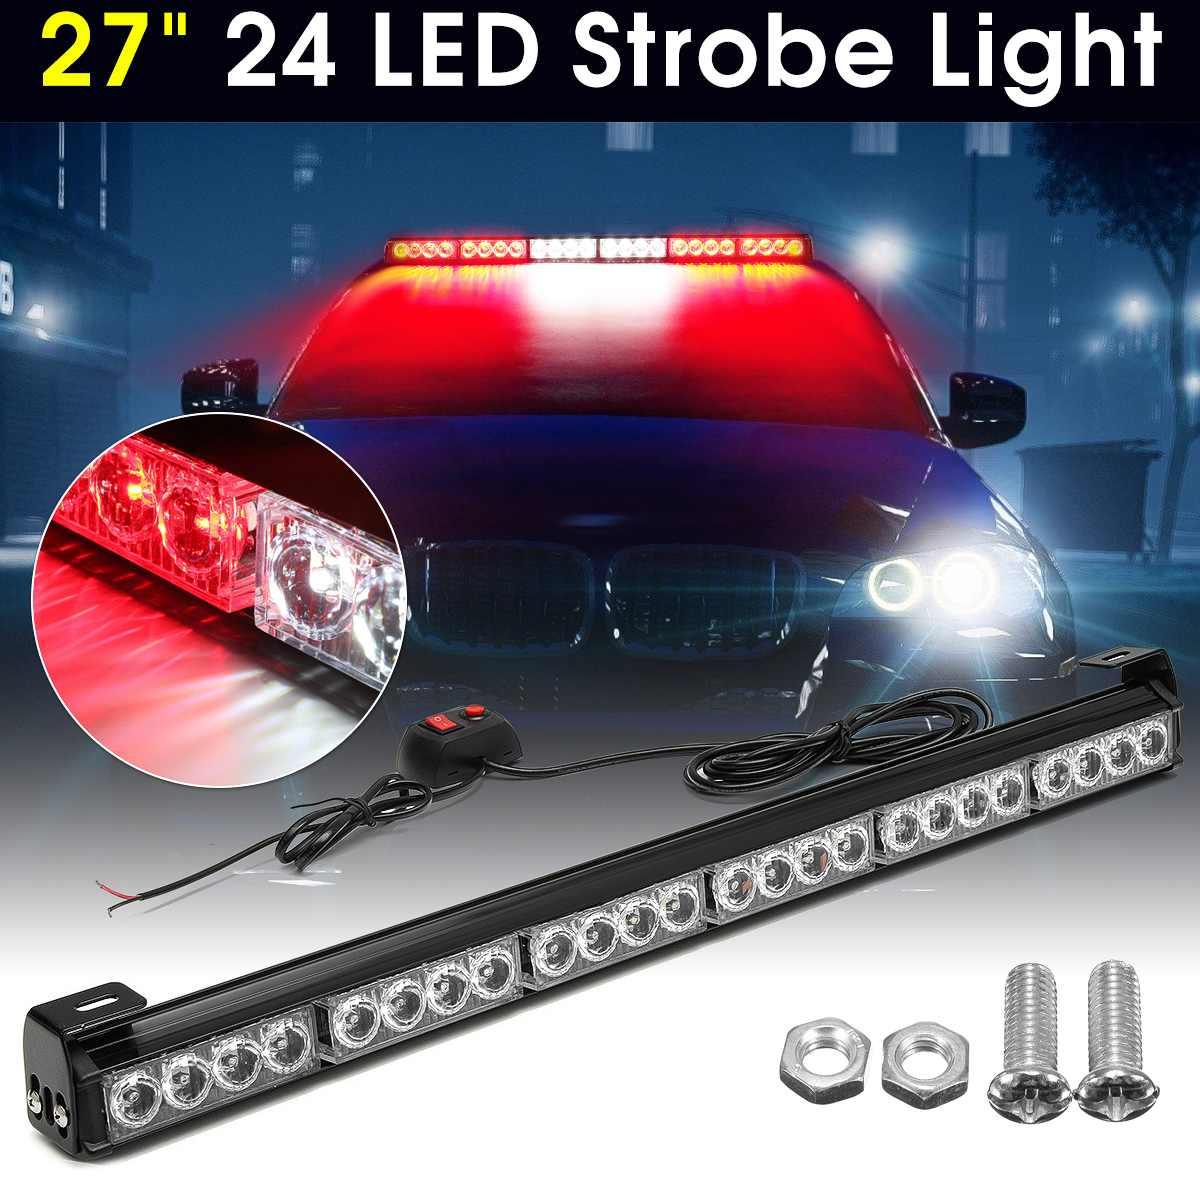 1PCS 27inch 24 LED White Red Emergency Traffic Hazard Flash Warning Light Bar Traffic Strobe Flashing Light Car Light Styling